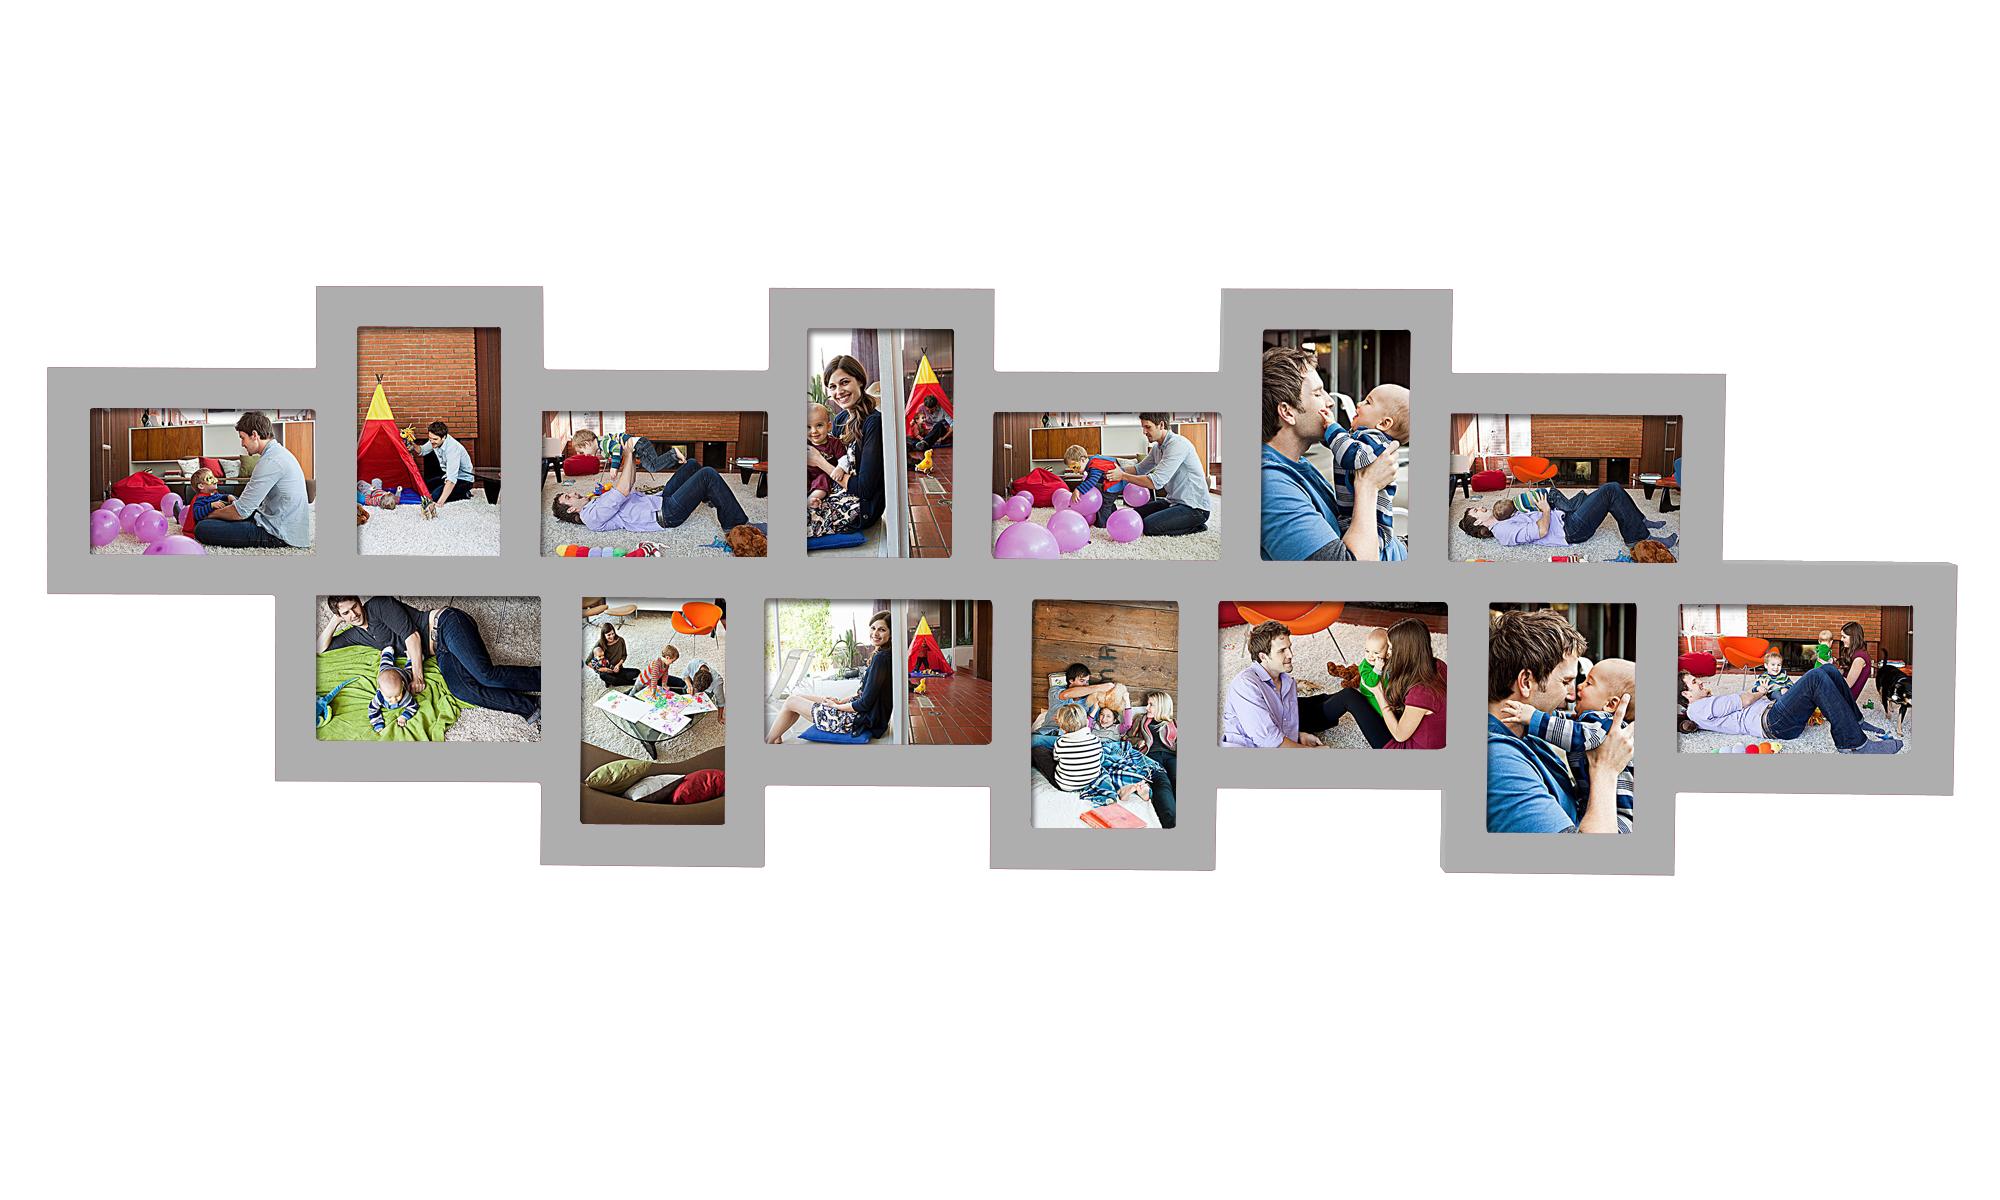 bilderrahmen bildergalerie fotorahmen wandgalerie bilder collage silber 127 3 ebay. Black Bedroom Furniture Sets. Home Design Ideas